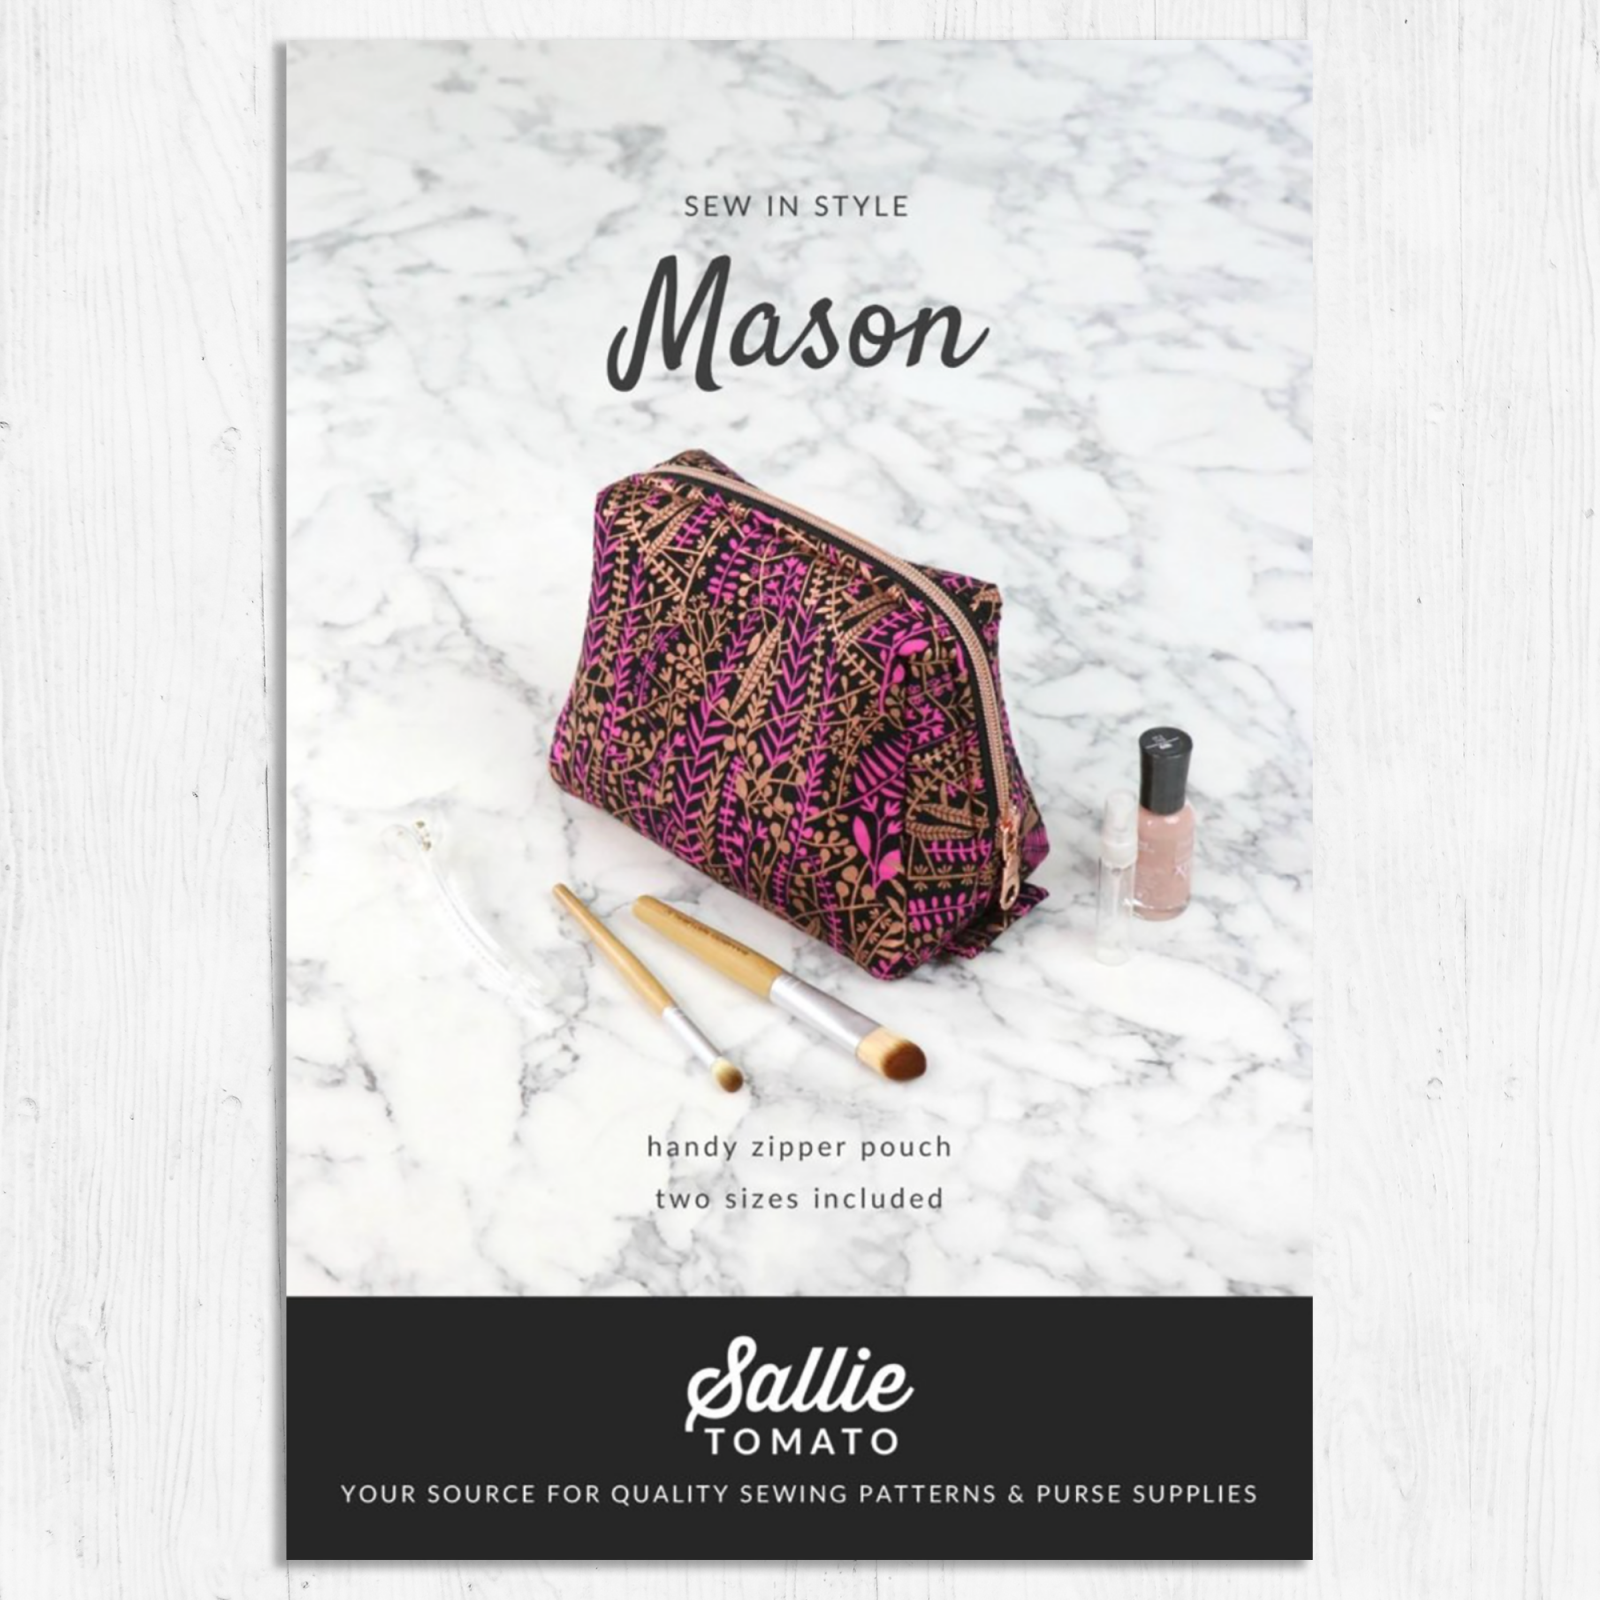 Sallie Tomato- Mason Bag Pattern